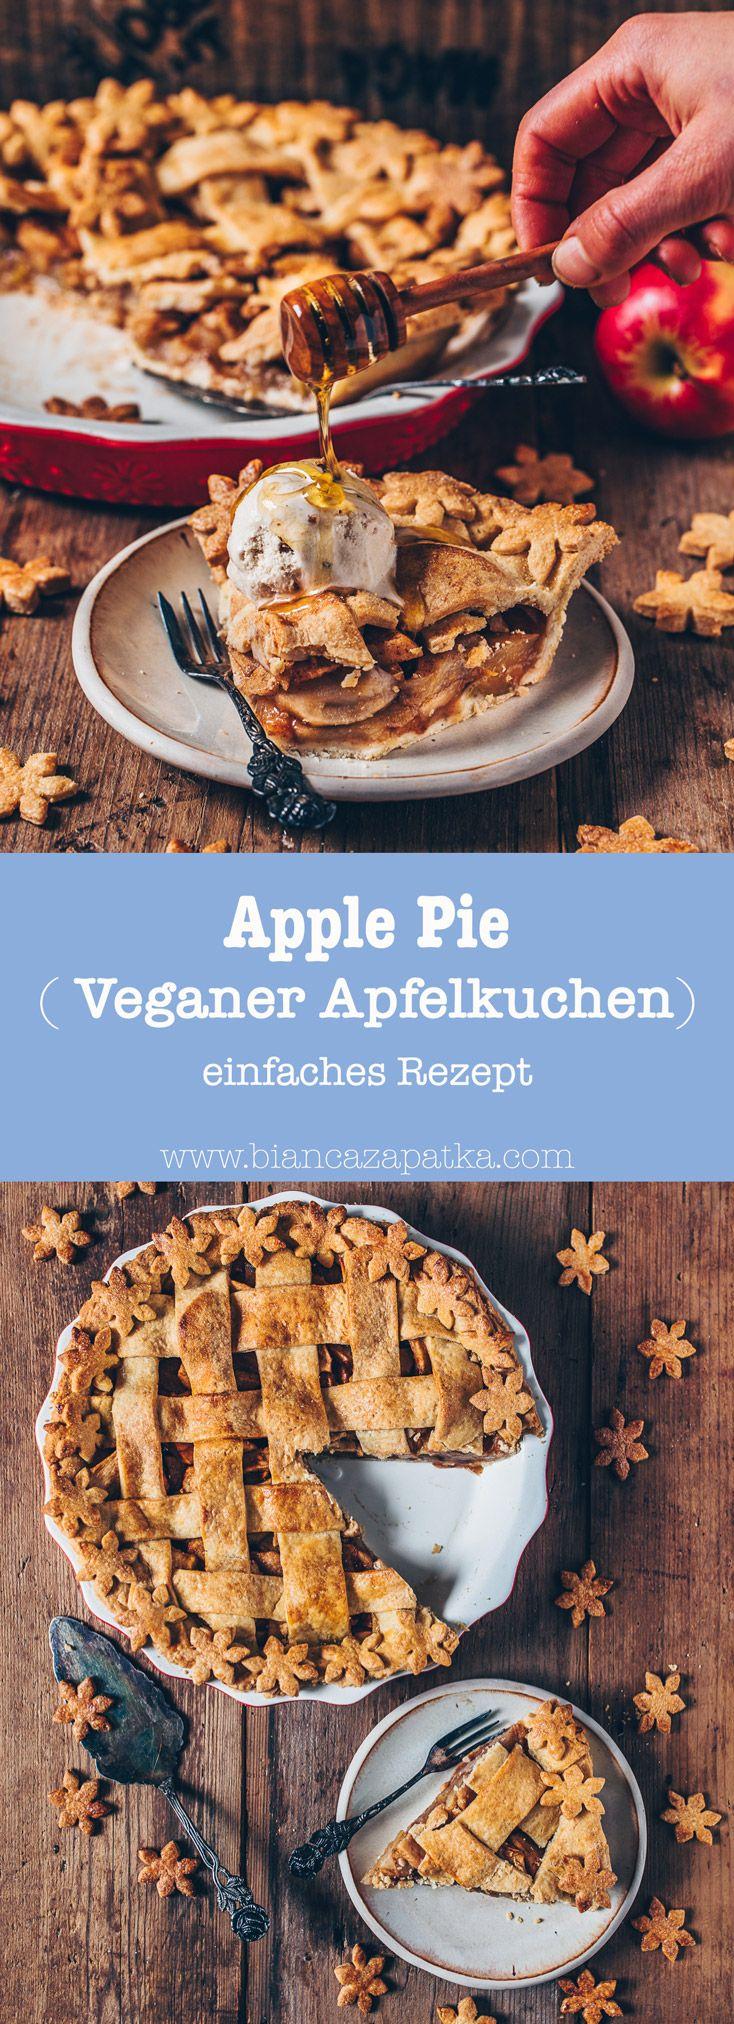 Apfelkuchen (Vegan Apple Pie) - einfaches Rezept - Bianca Zapatka | Rezepte